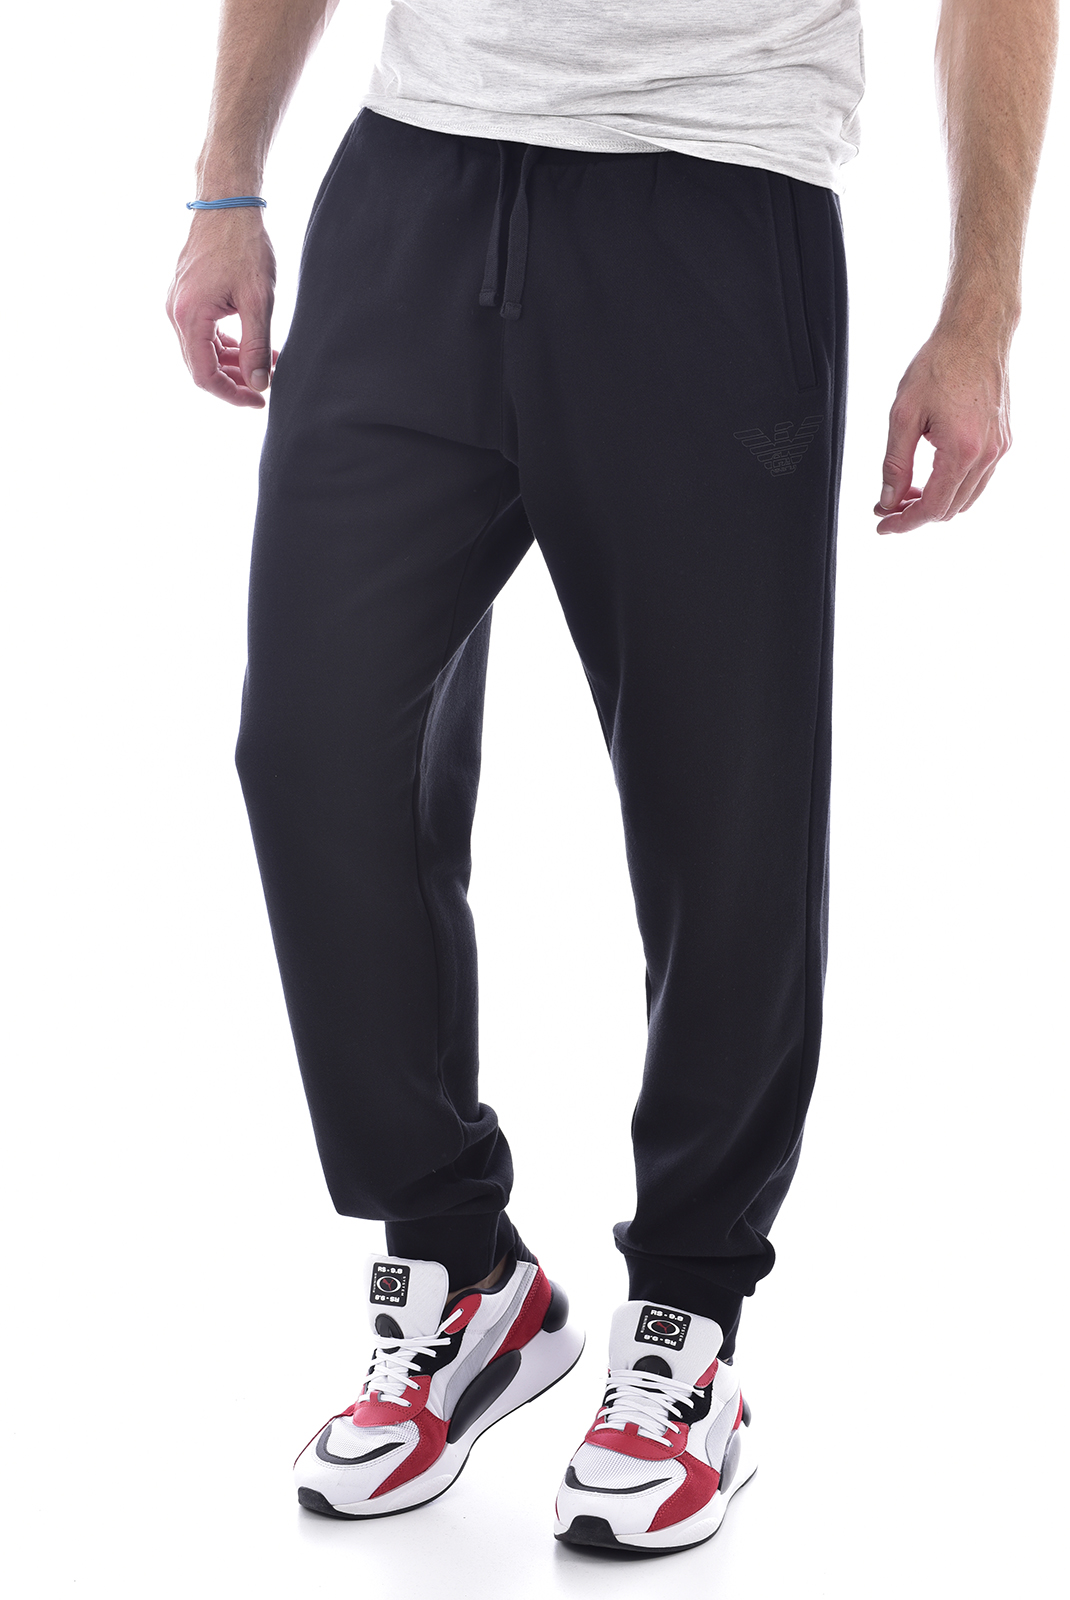 Pantalons sport/streetwear  Emporio armani 111869 0A560 020 BLACK